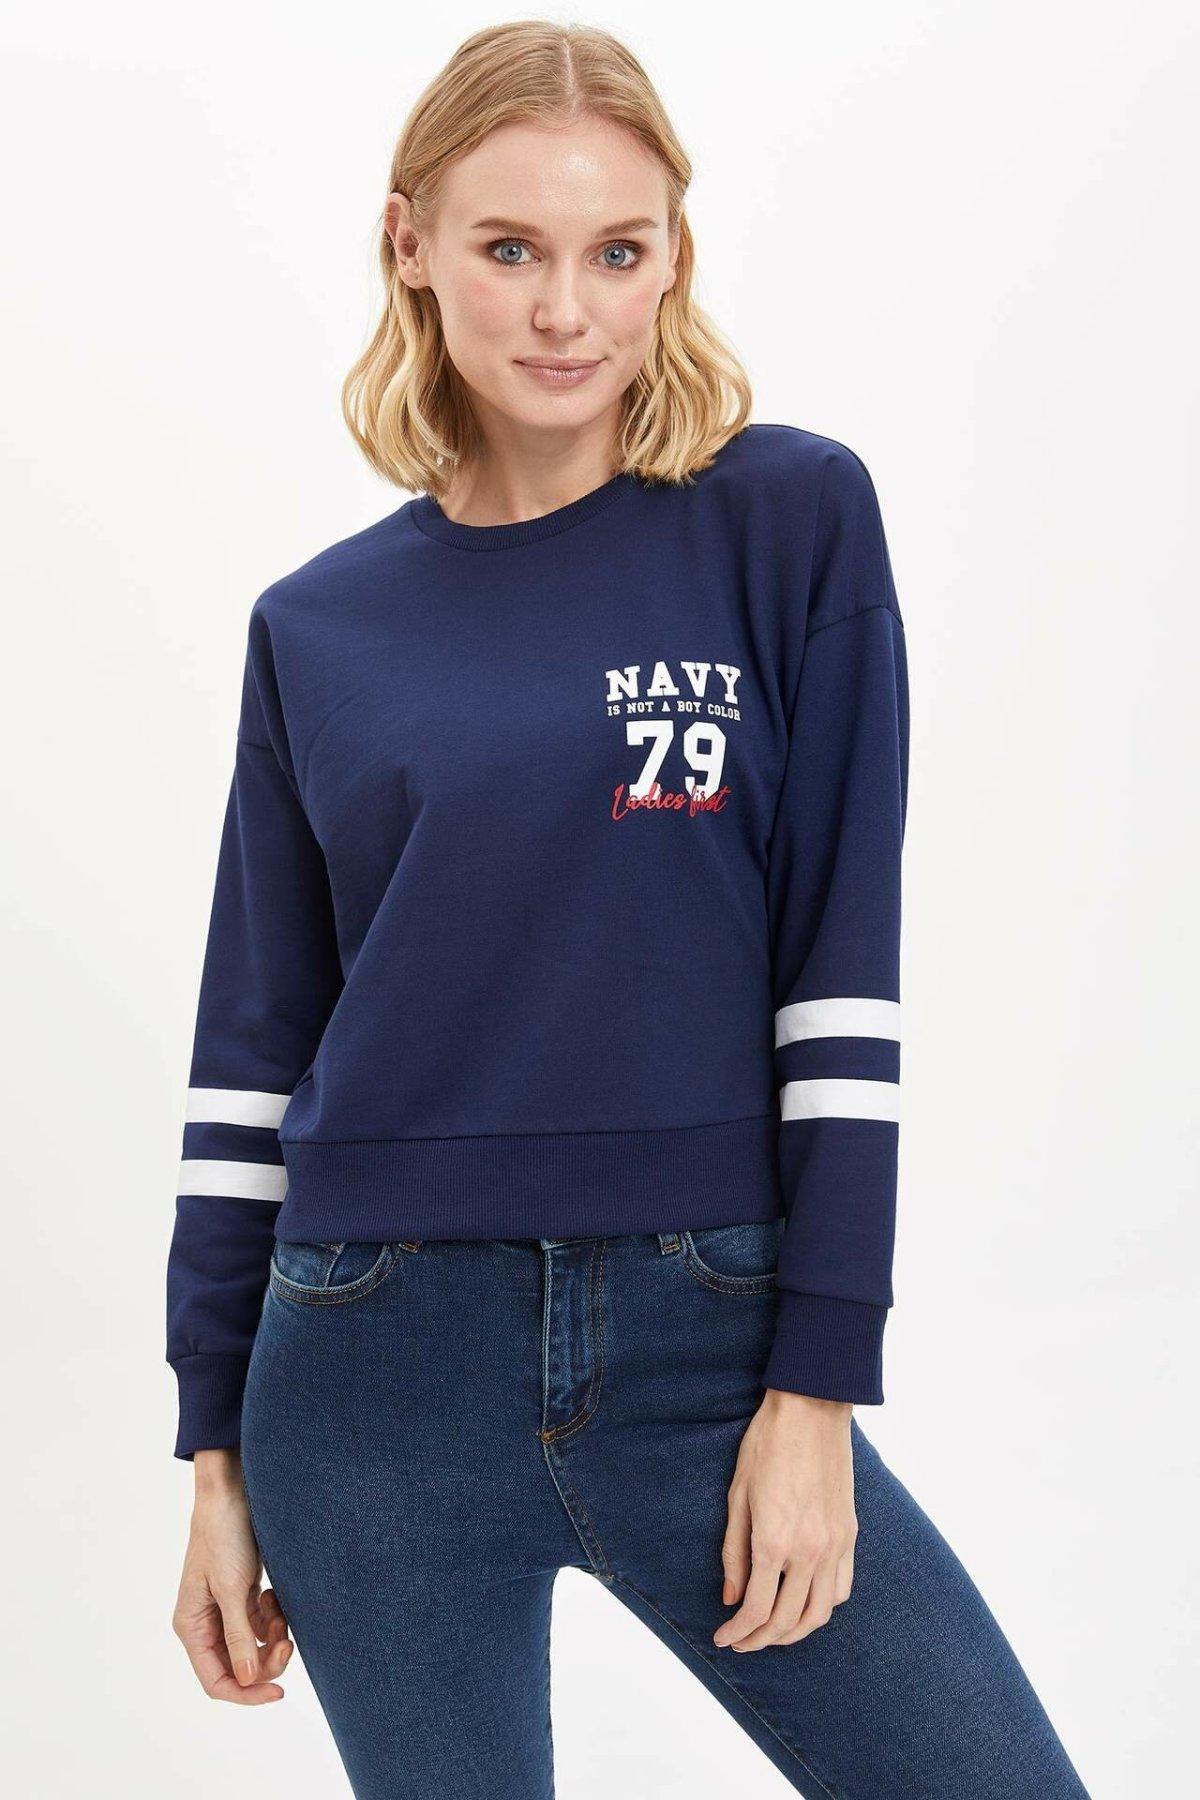 DeFacto Woman Fashion Joker Crewneck Sport Pullovers Loose Long Sleeves Casual Pullovers Women Autumn New - K6864AZ18CW